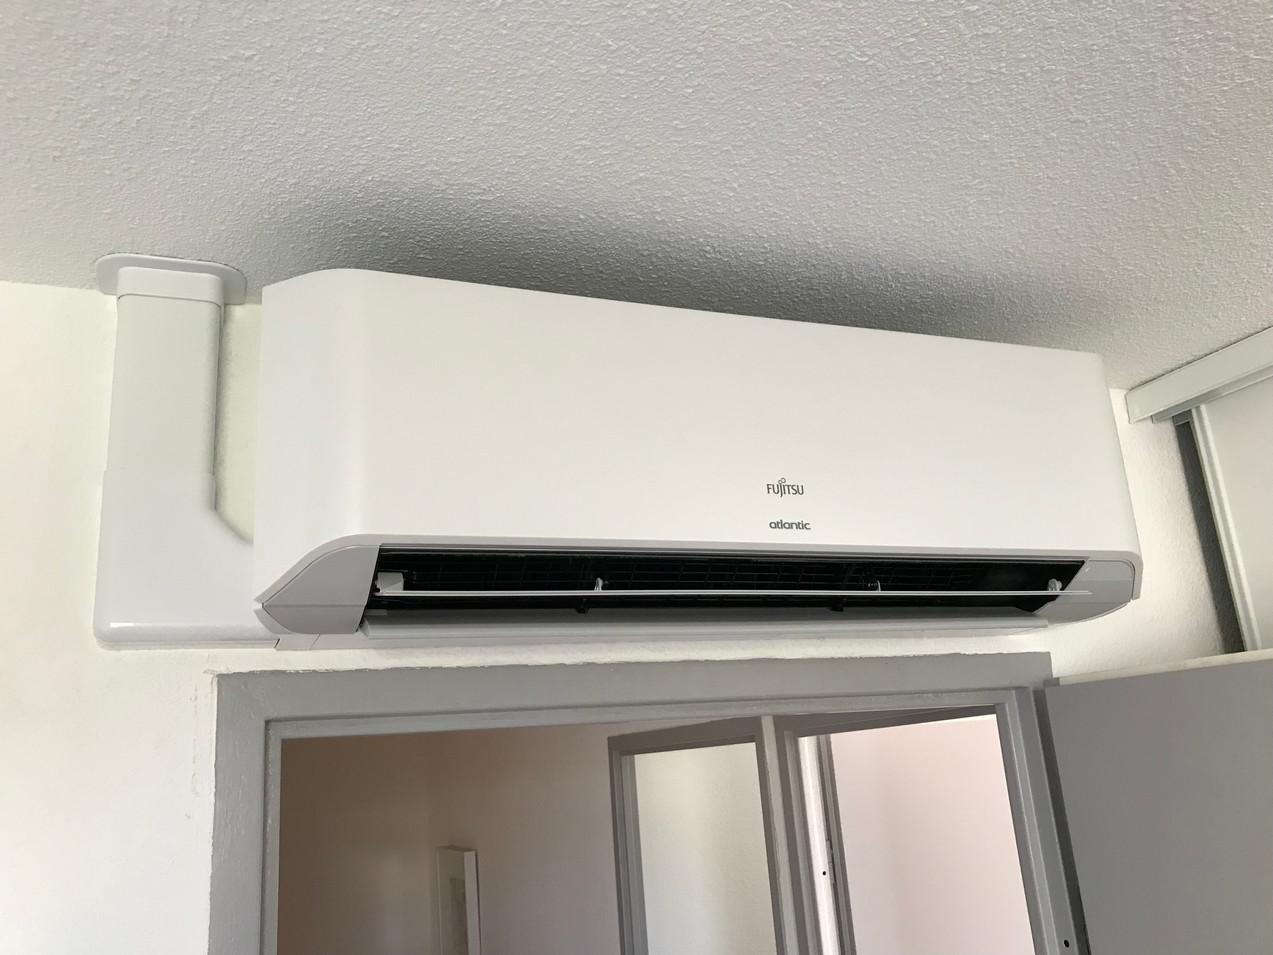 climatisationaixlesmilles